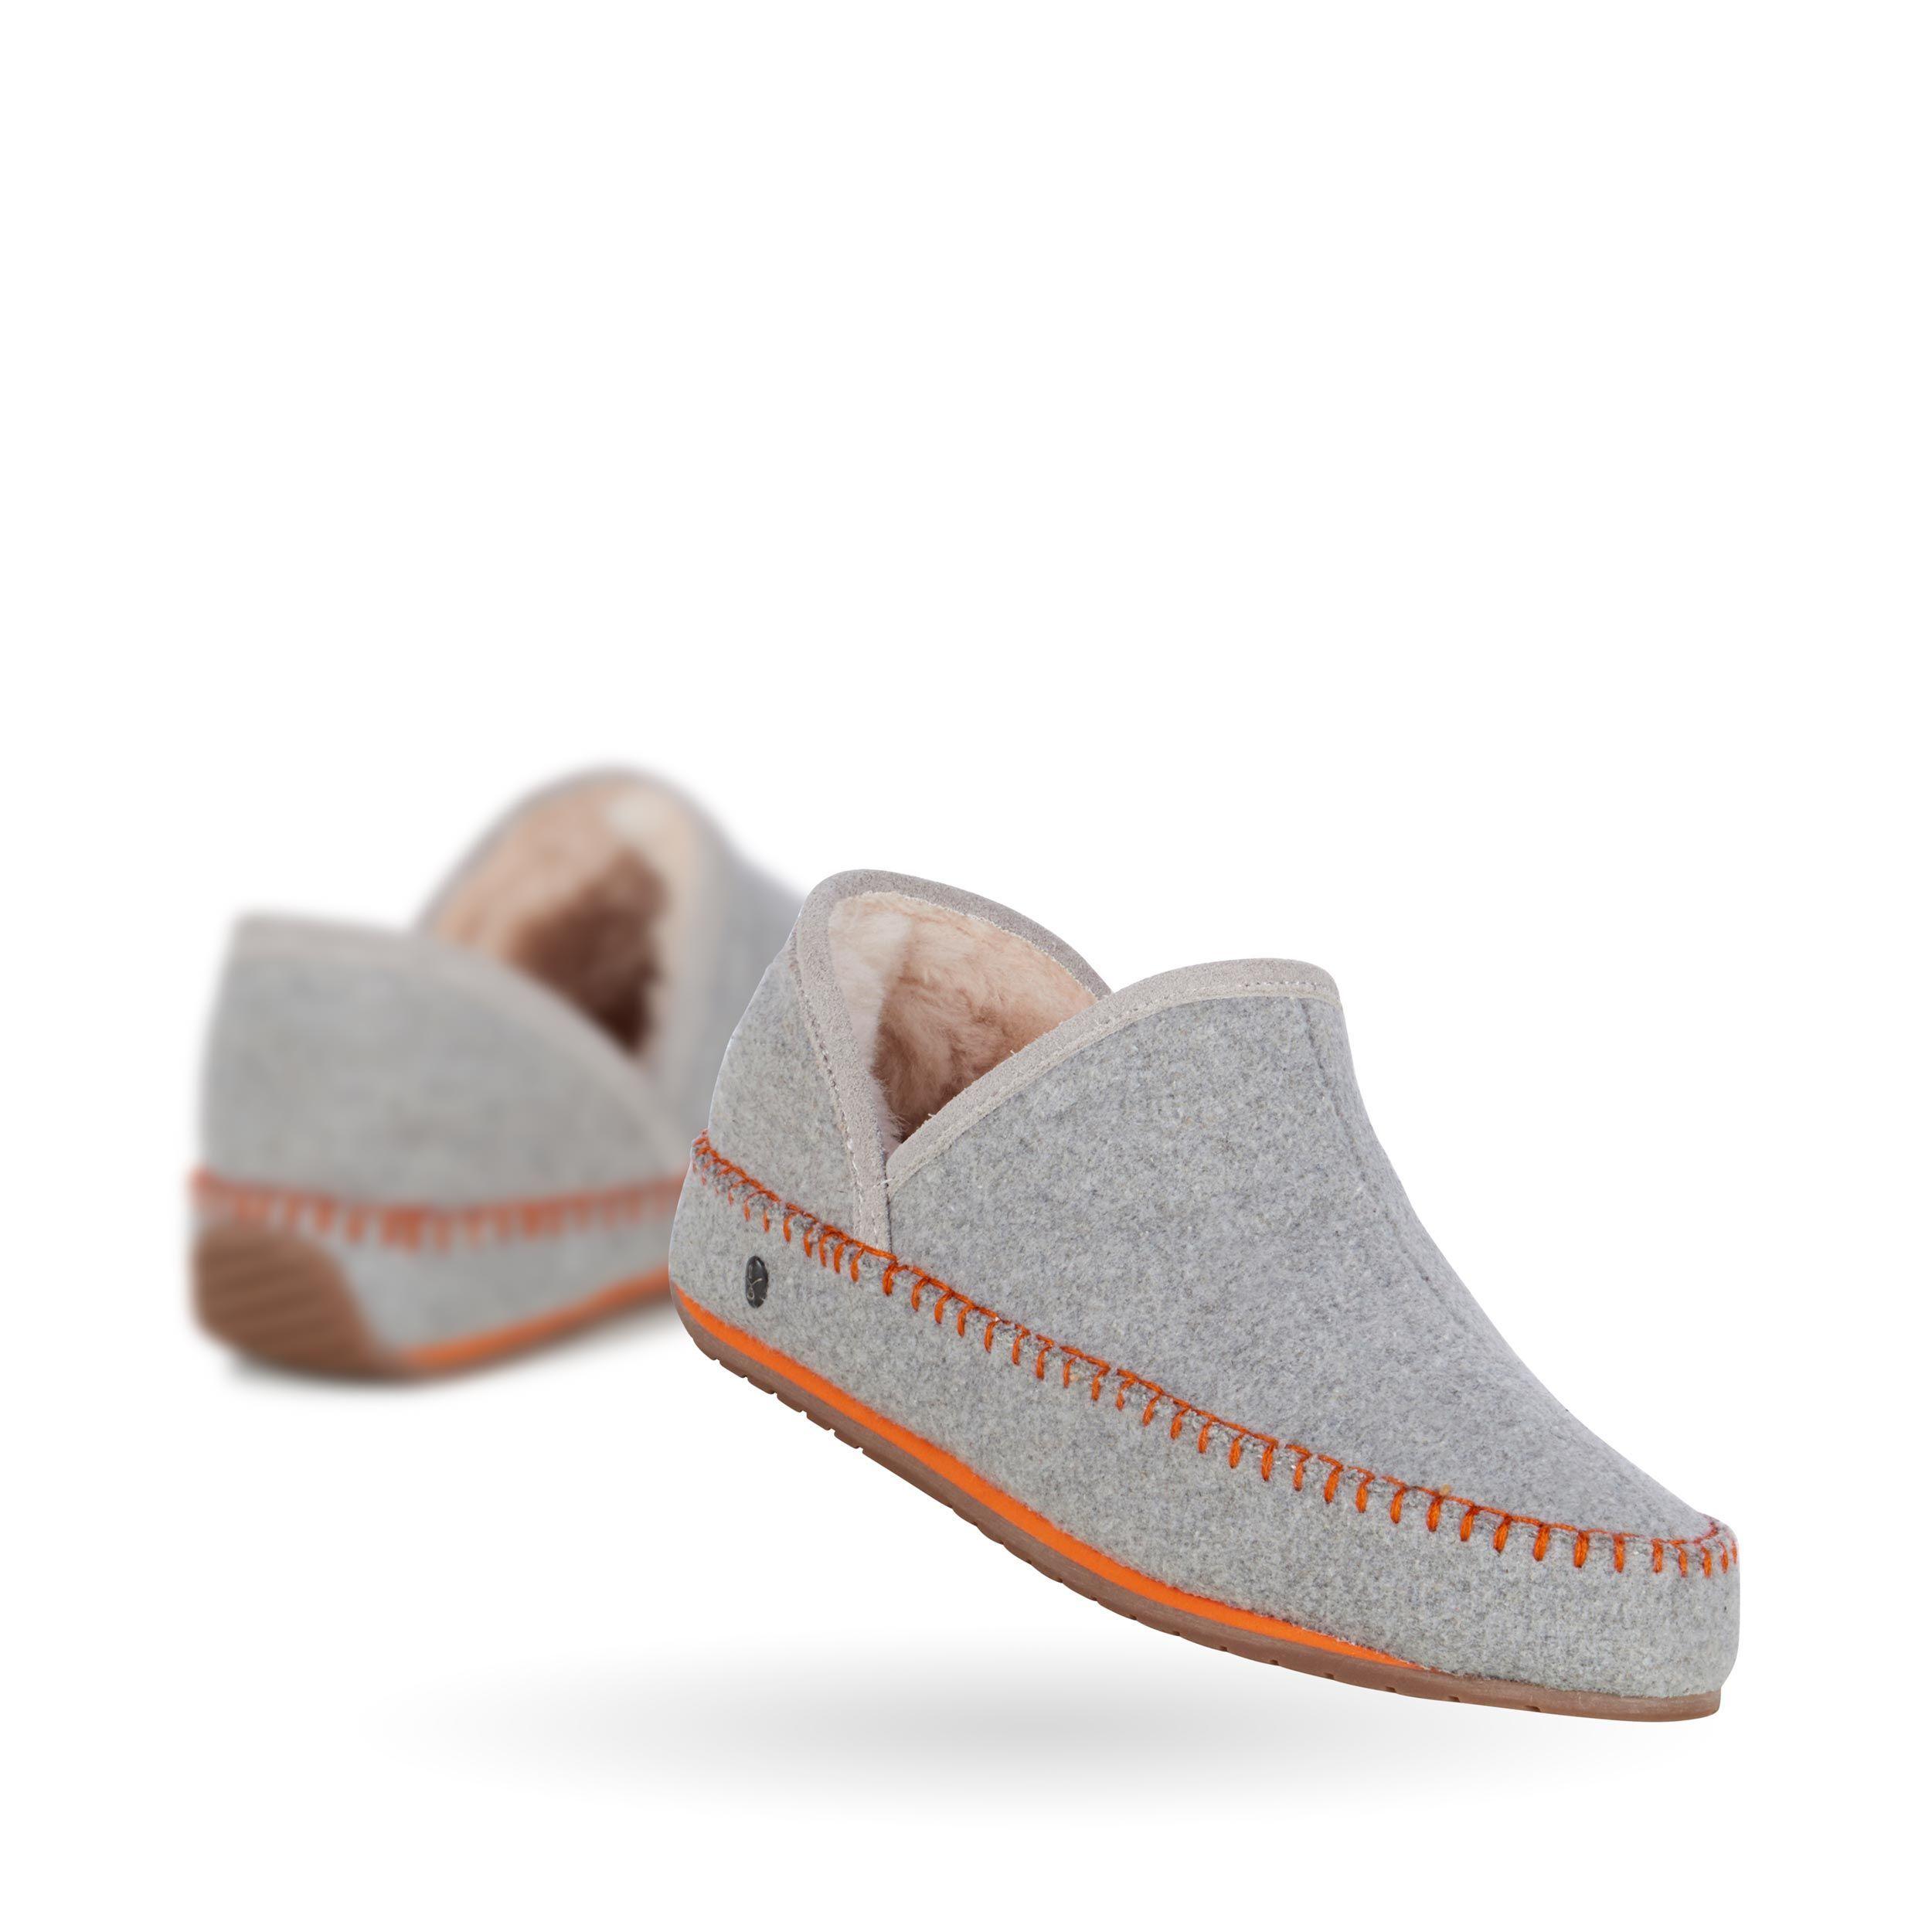 892a21d823c2 Lochlan Womens Deluxe Wool Mocc- EMU Australia